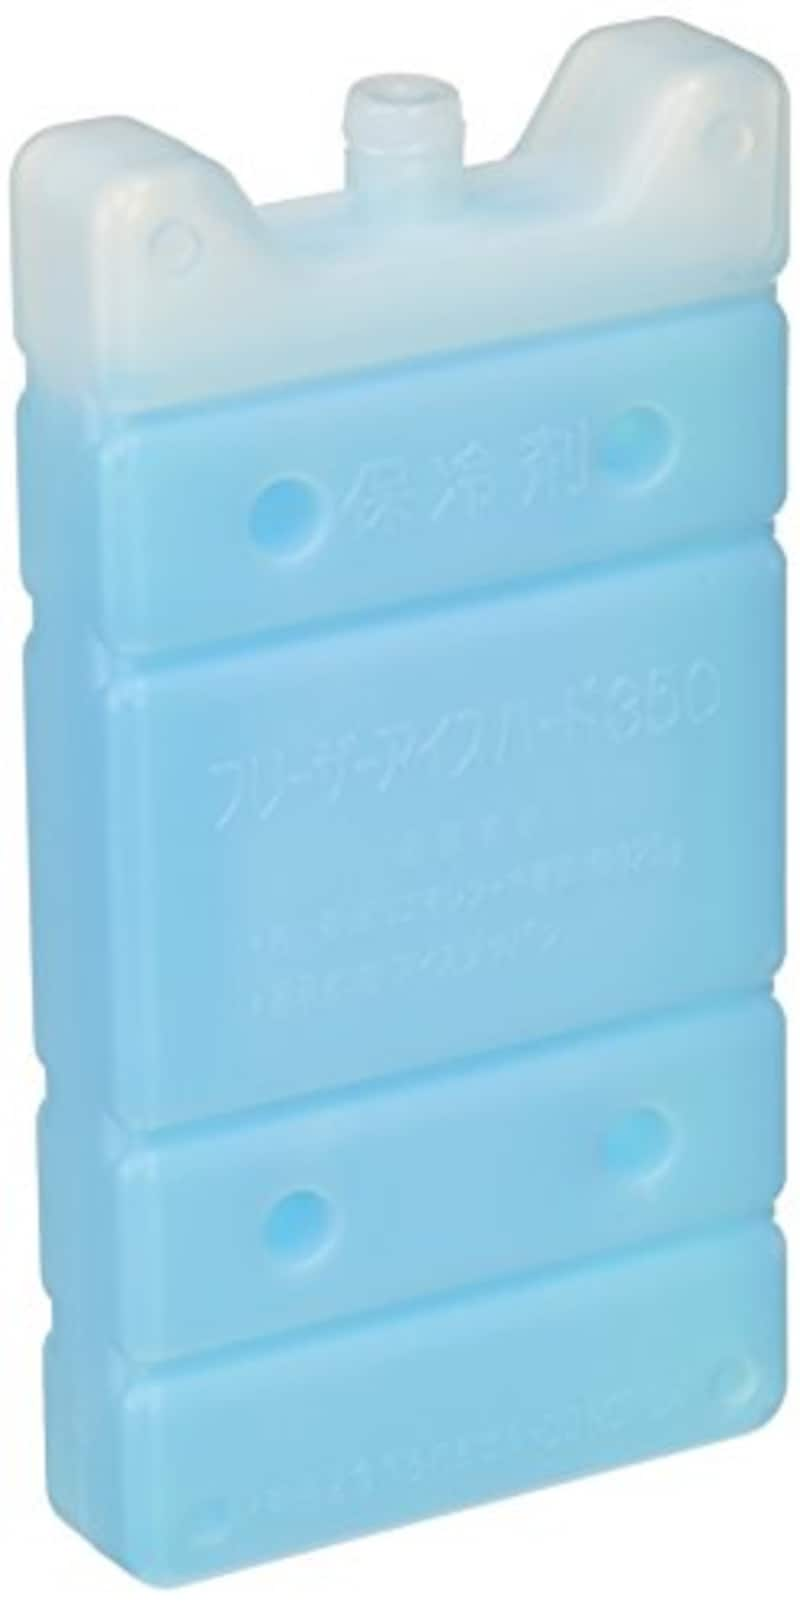 ICE JAPAN(アイスジャパン),保冷剤 フリーザーアイスハード,FIH-03S